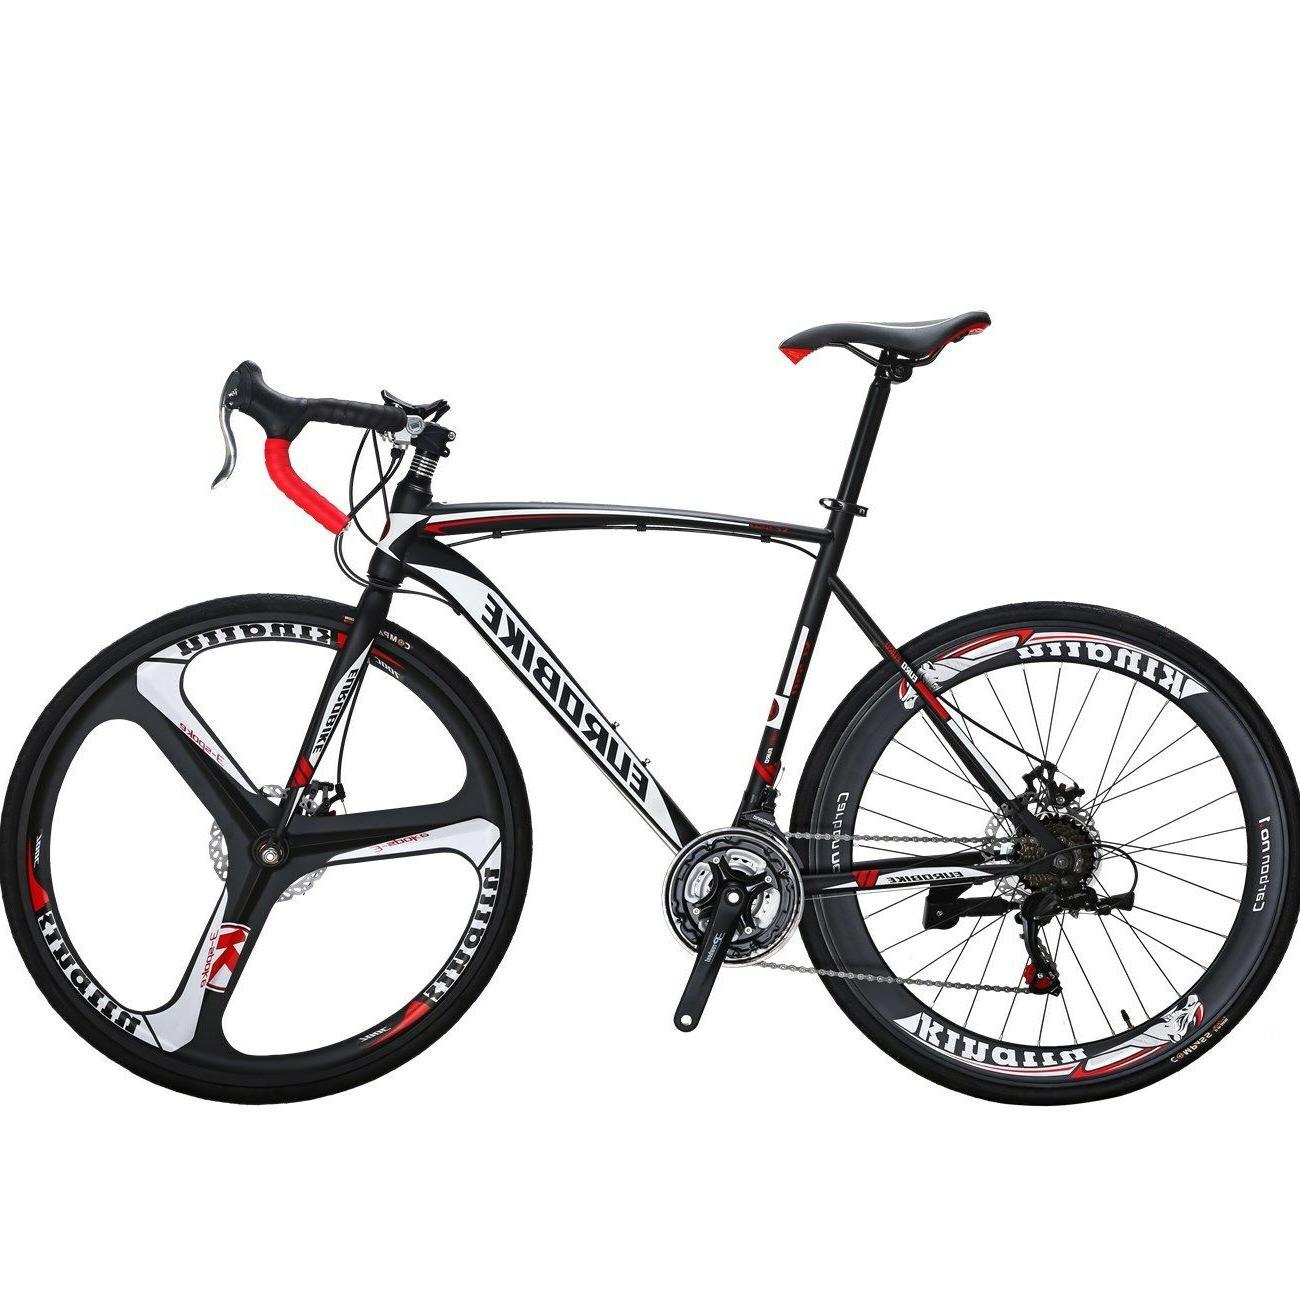 2018 Bike 21 Speed Bicyle Bikes Cycling 54cm